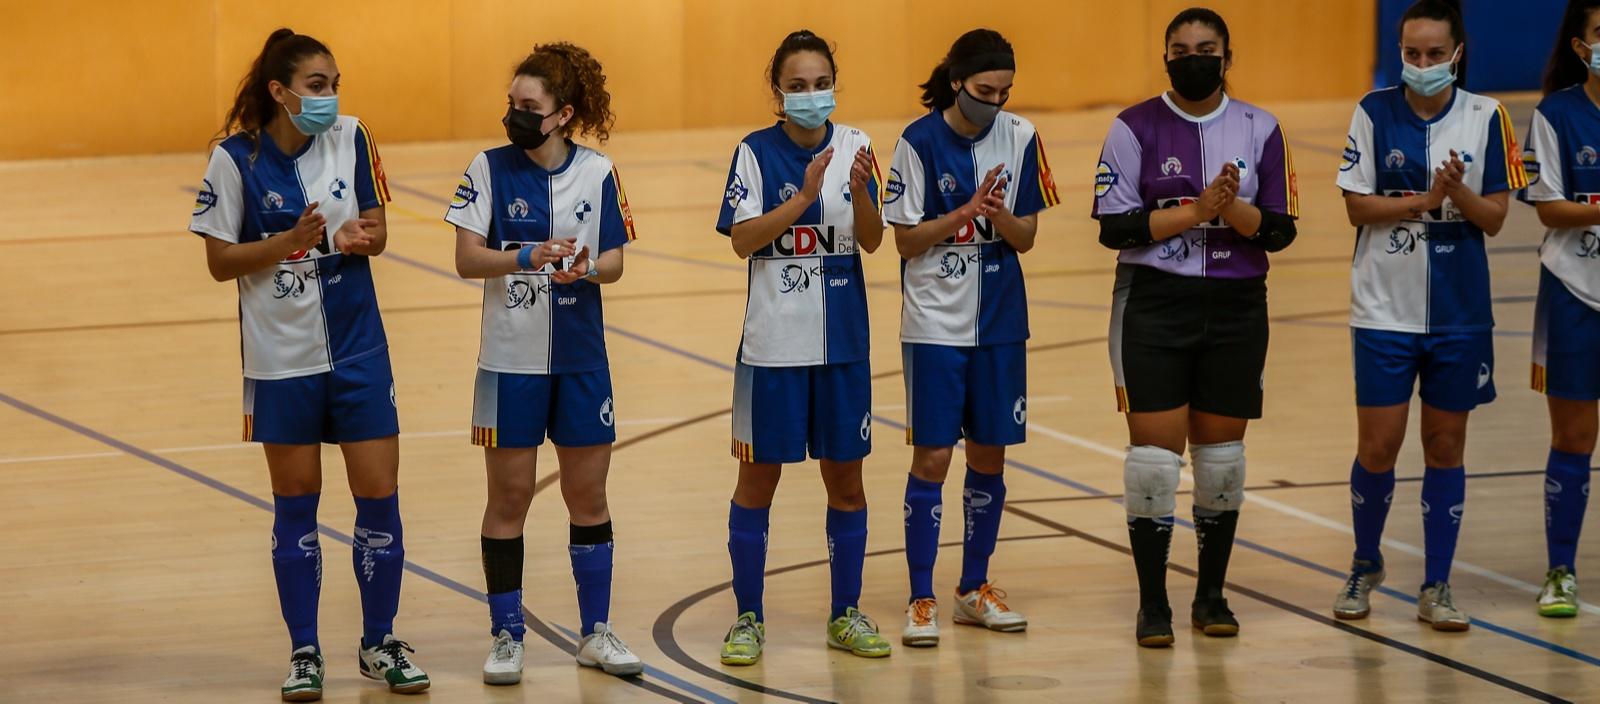 Comença la Segona RFEF Futsal femenina